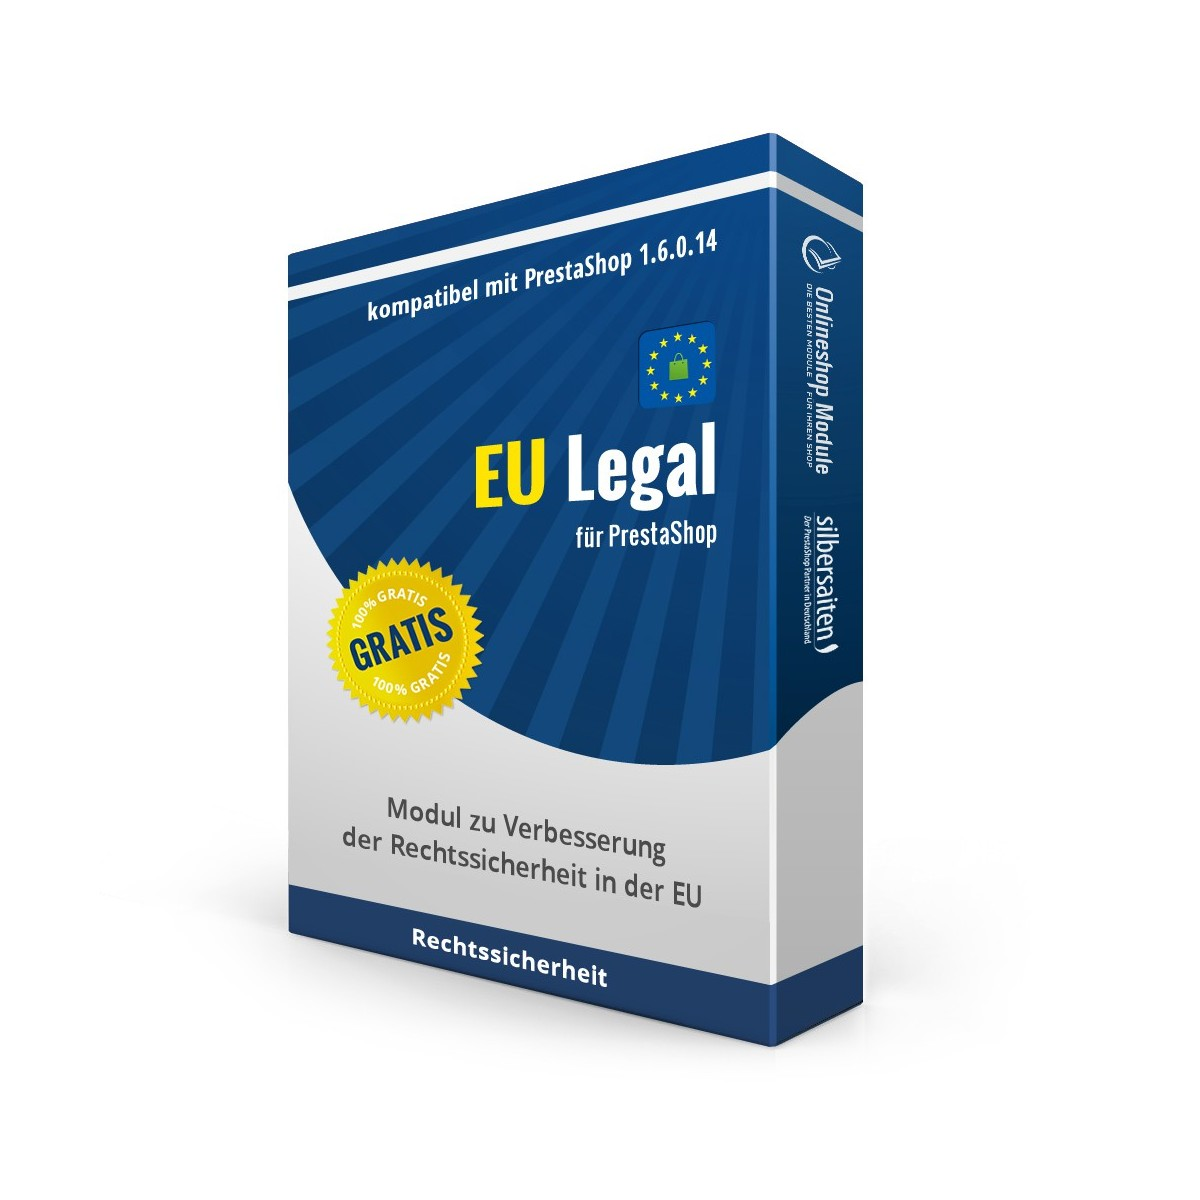 EU-Legal für PrestaShop 1.6.0.14